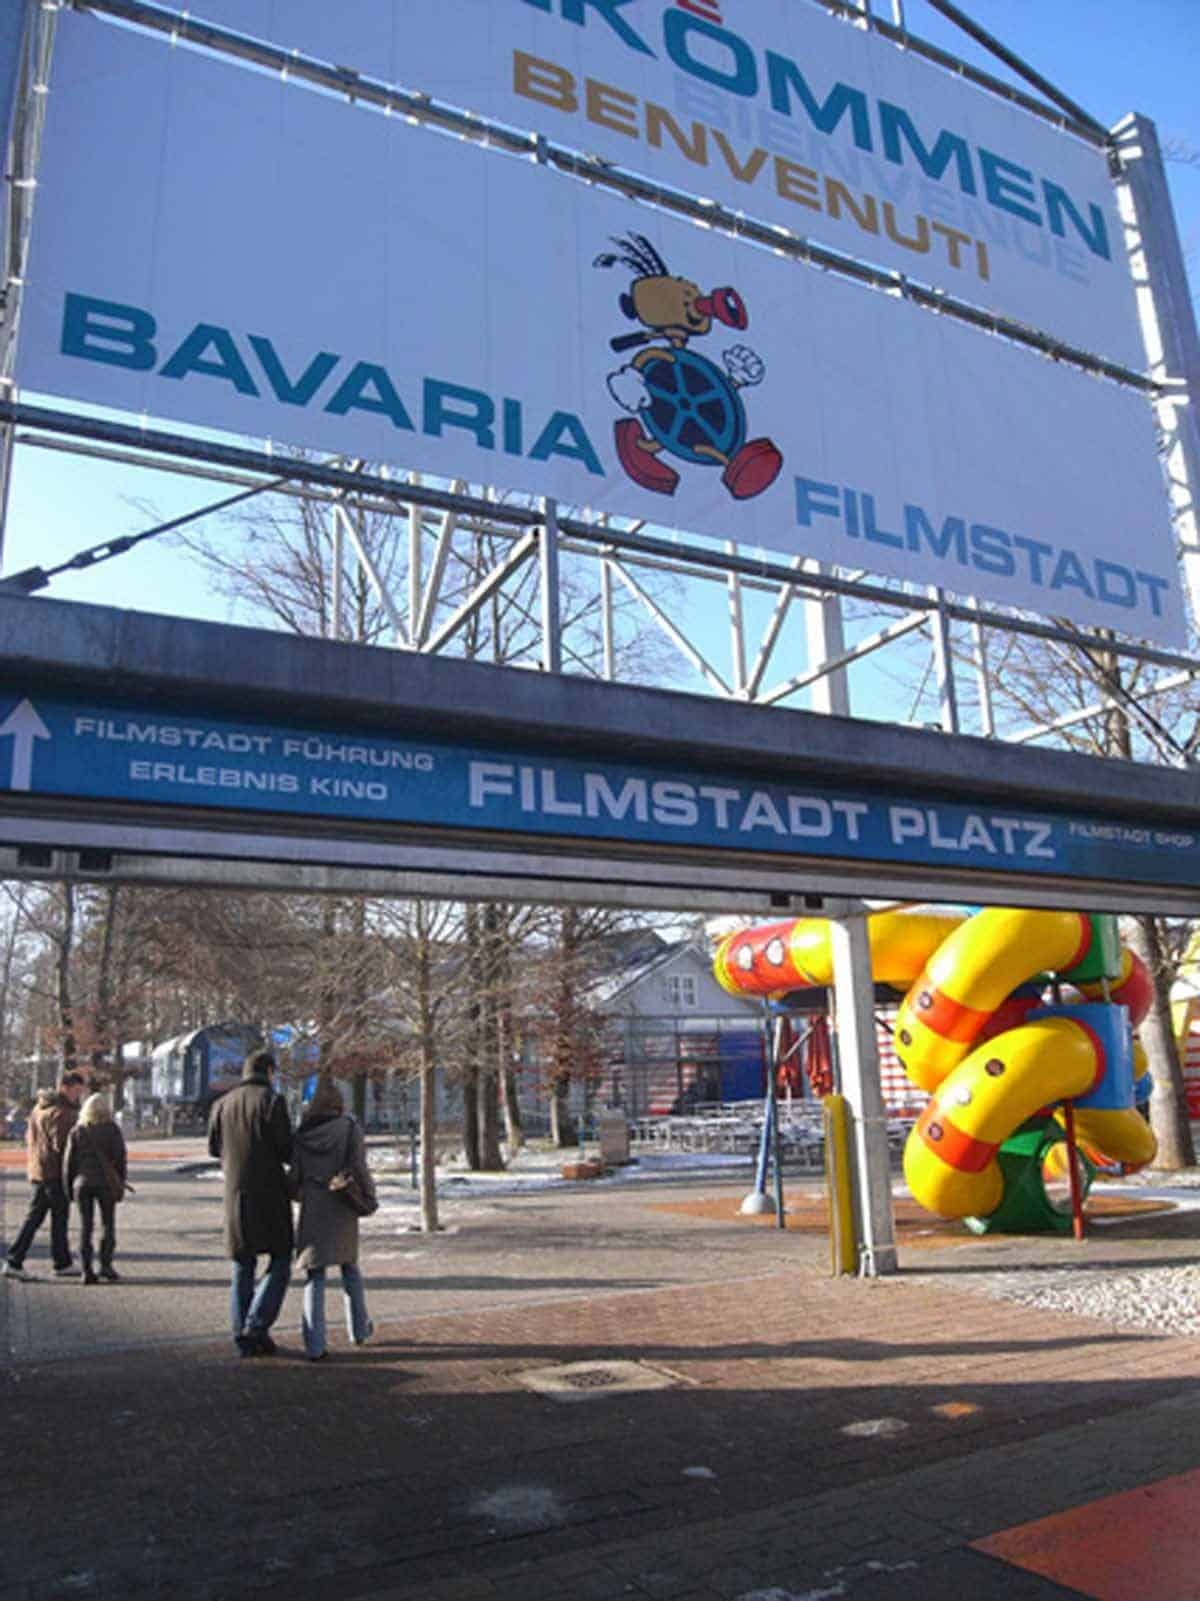 top tourist attractions in munich germany bavaria filmstadt